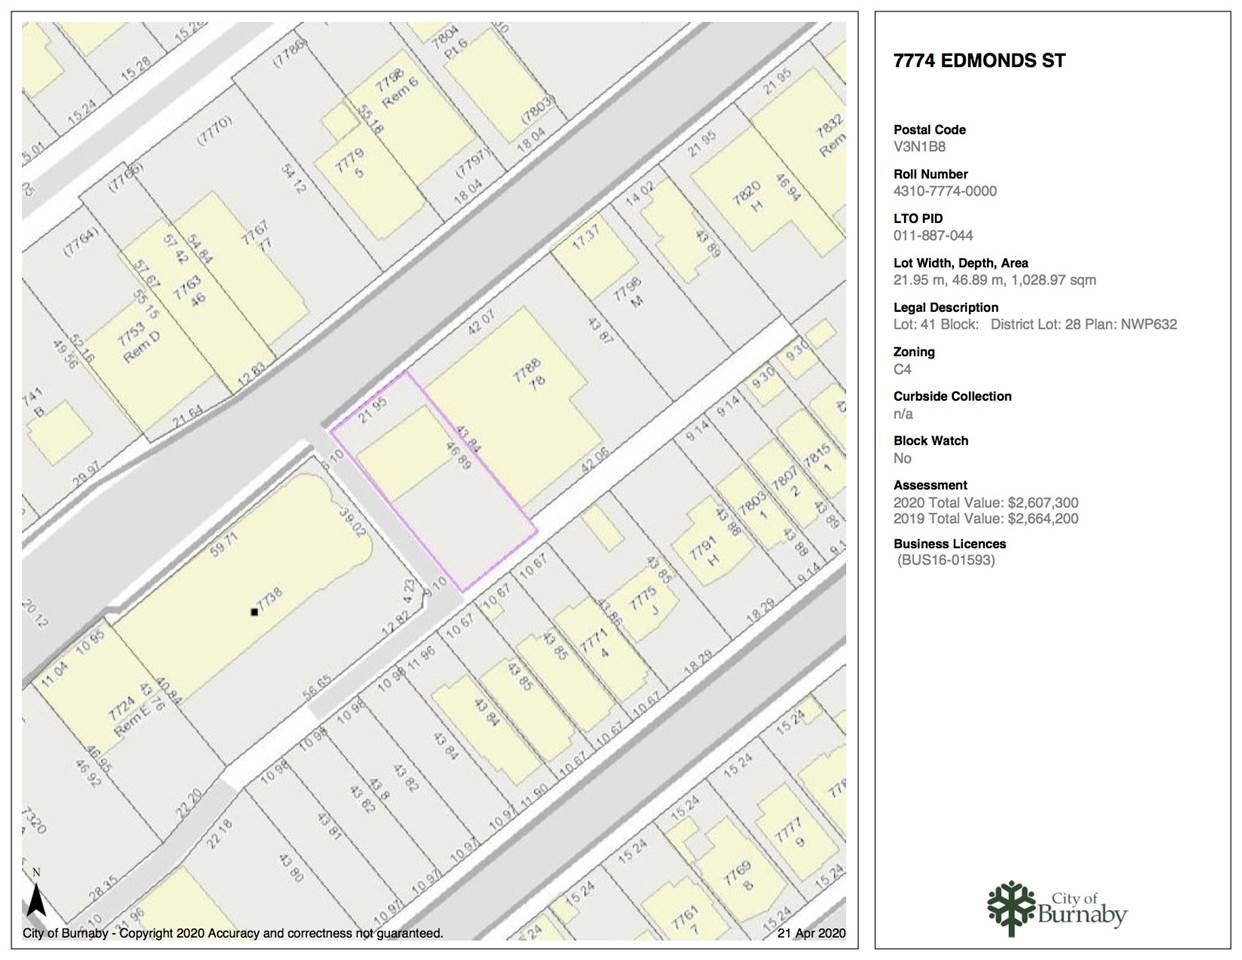 7774 EDMONDS STREET - MLS® # R2451558